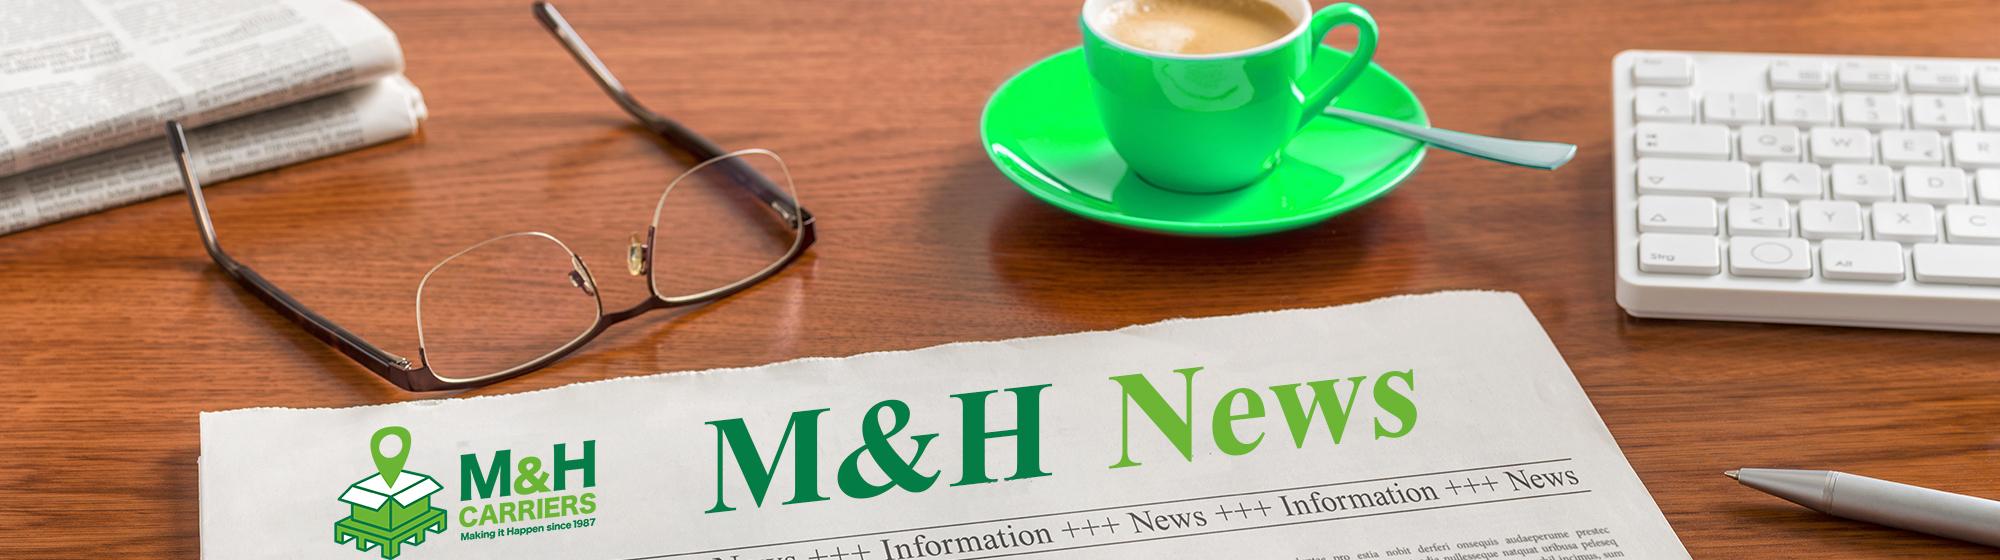 M&H News